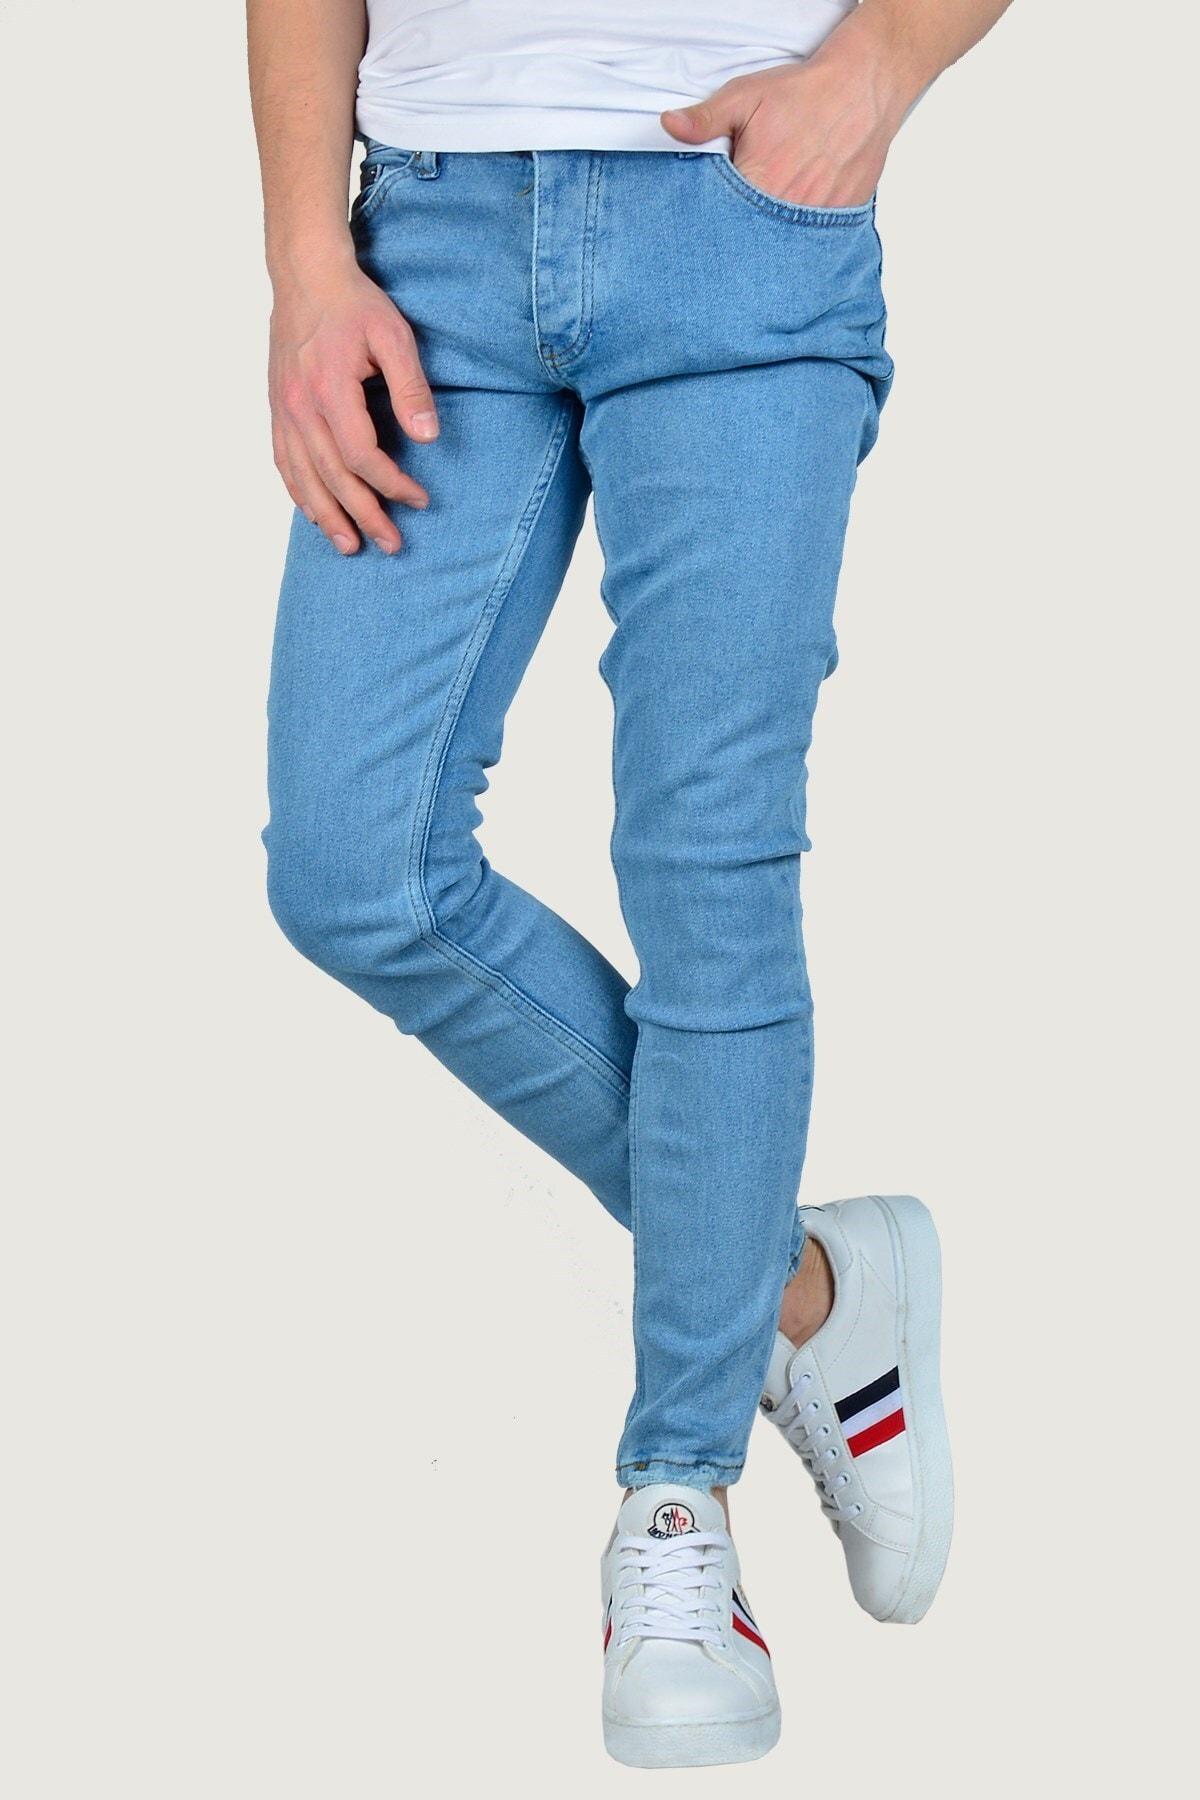 Terapi Men Erkek Kot Pantolon 9K-2100341-007 Buz Mavisi